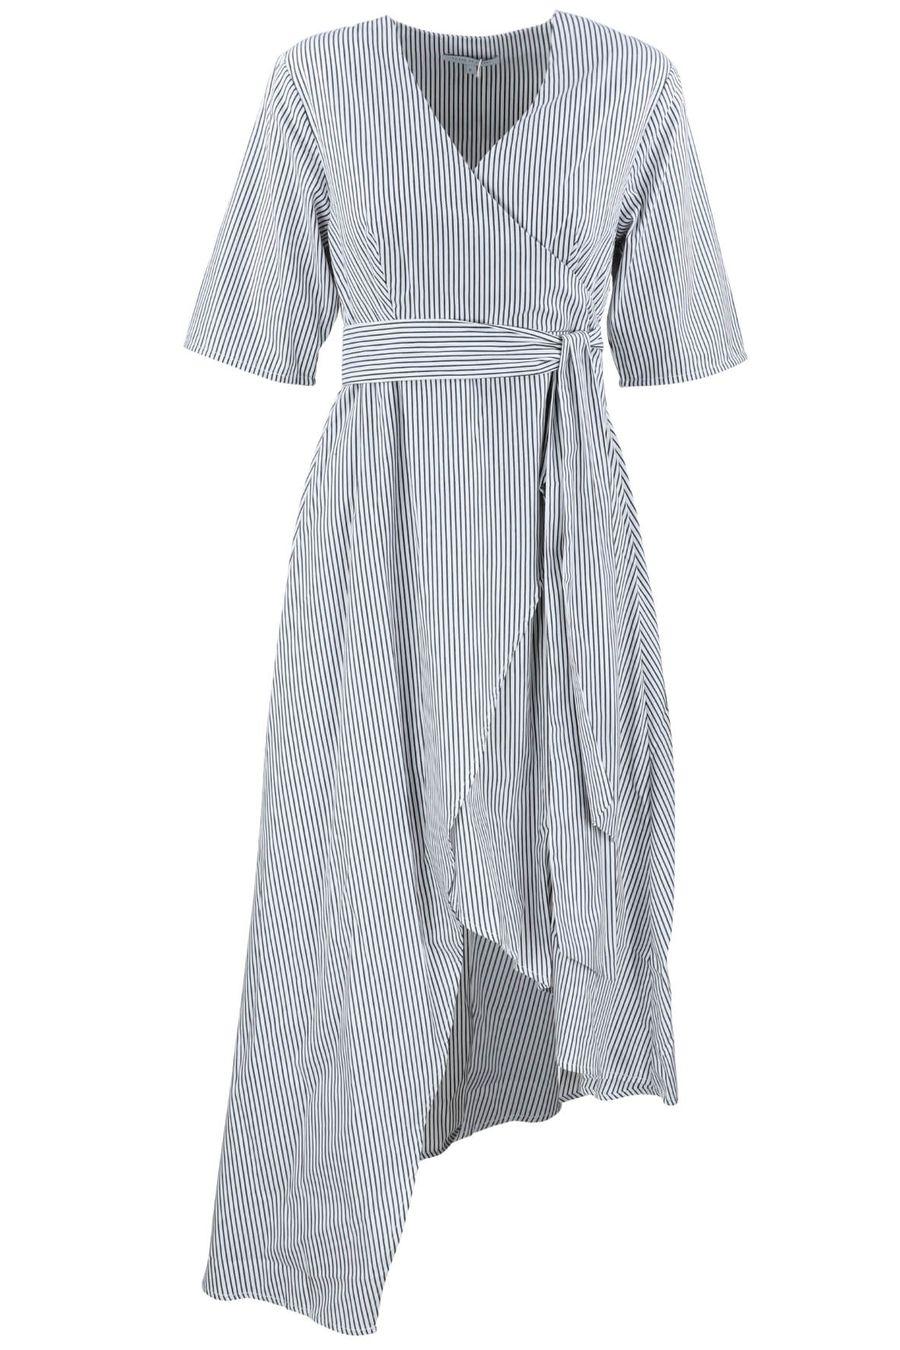 friend-of-audrey-french-riviera-striped-wrap-dress-1